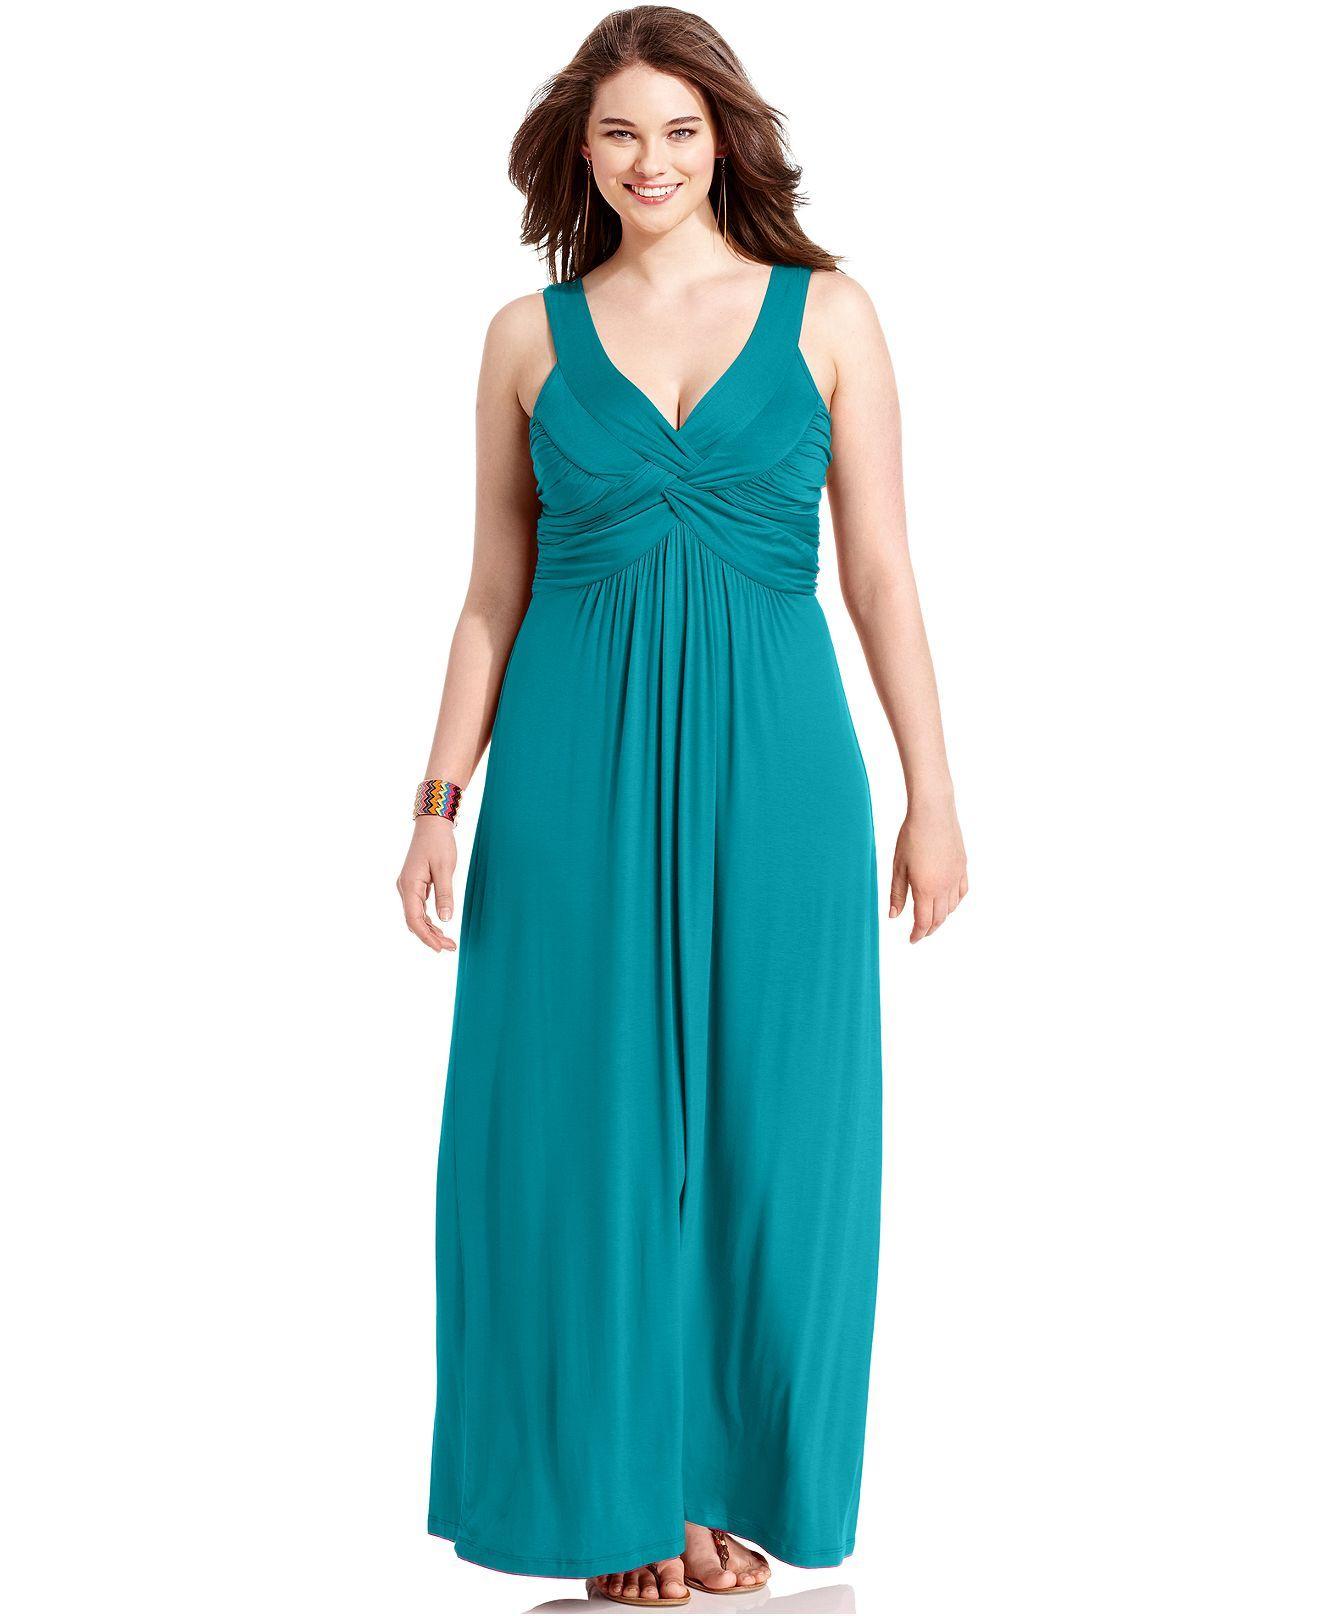 ING Plus Size Dress, Sleeveless Ruched Maxi - Plus Size Dresses ...